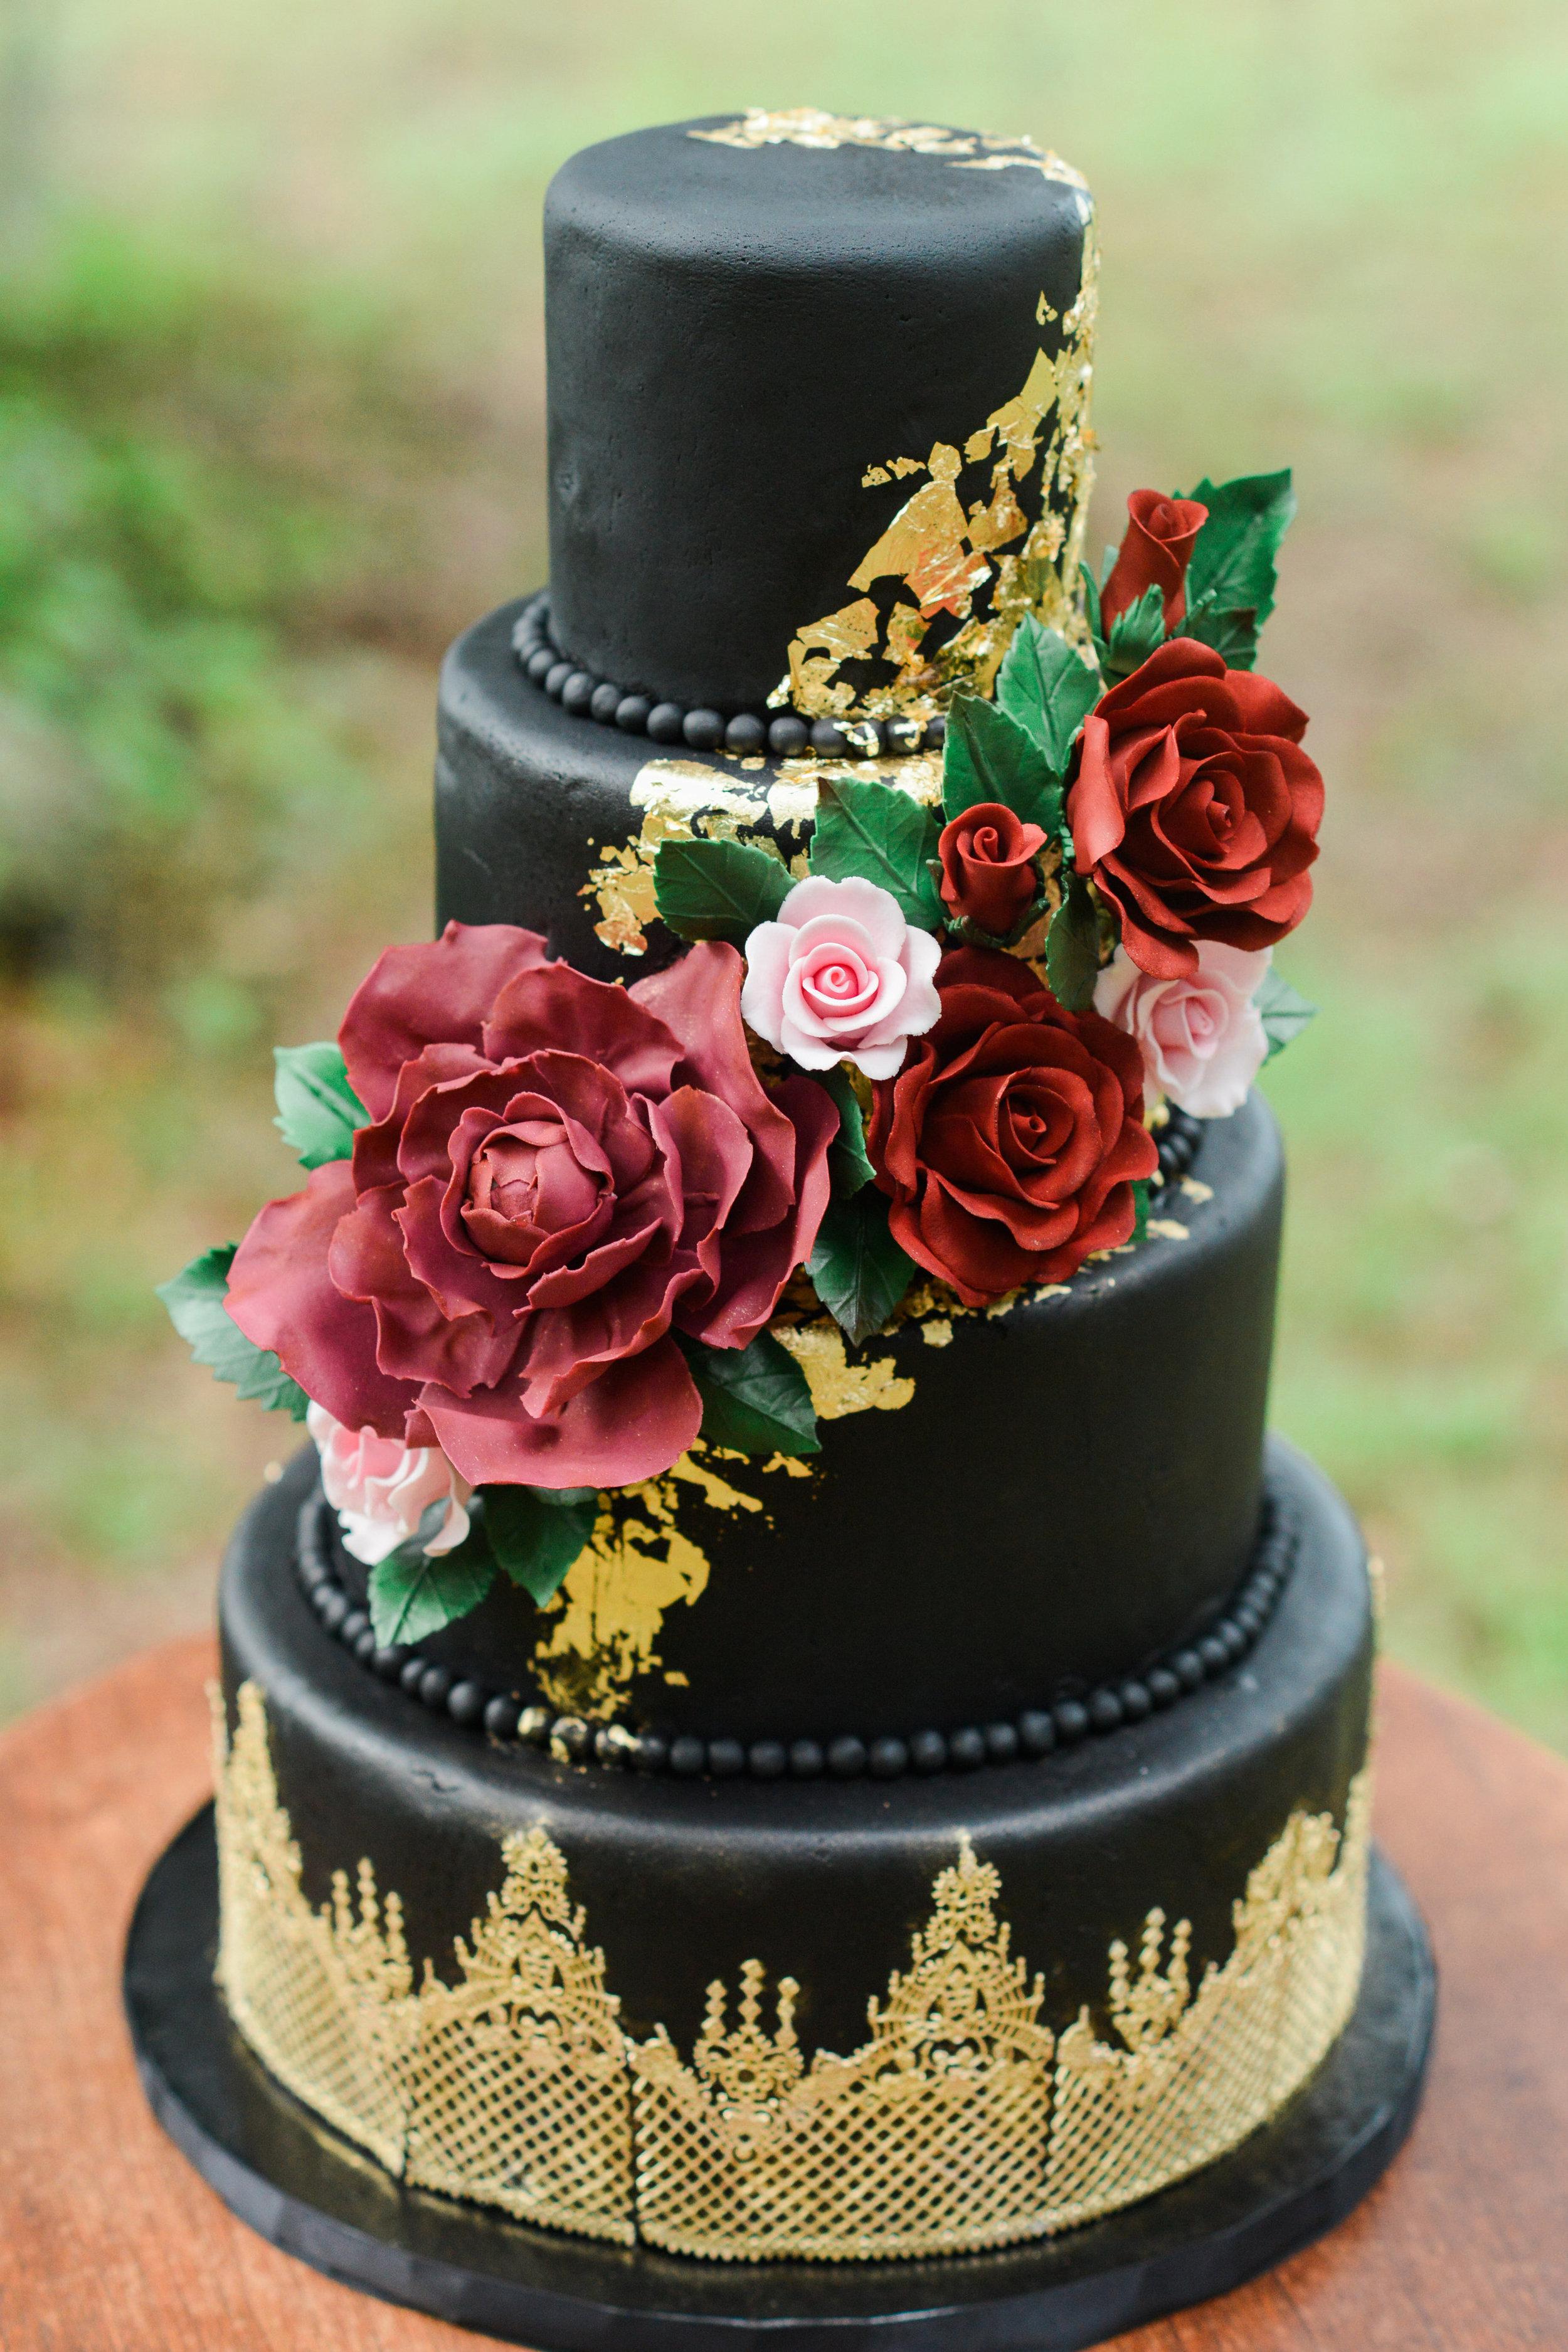 callie-beale-photography-Bonaventure-cemetery-michelle-royal-makeup-cemetery-wedding-ivory-and-beau-wedding-planning-anna-campbell-harper-savannah-bridal-boutique-savannah-wedding-dresses-savannah-weddings-18.jpg